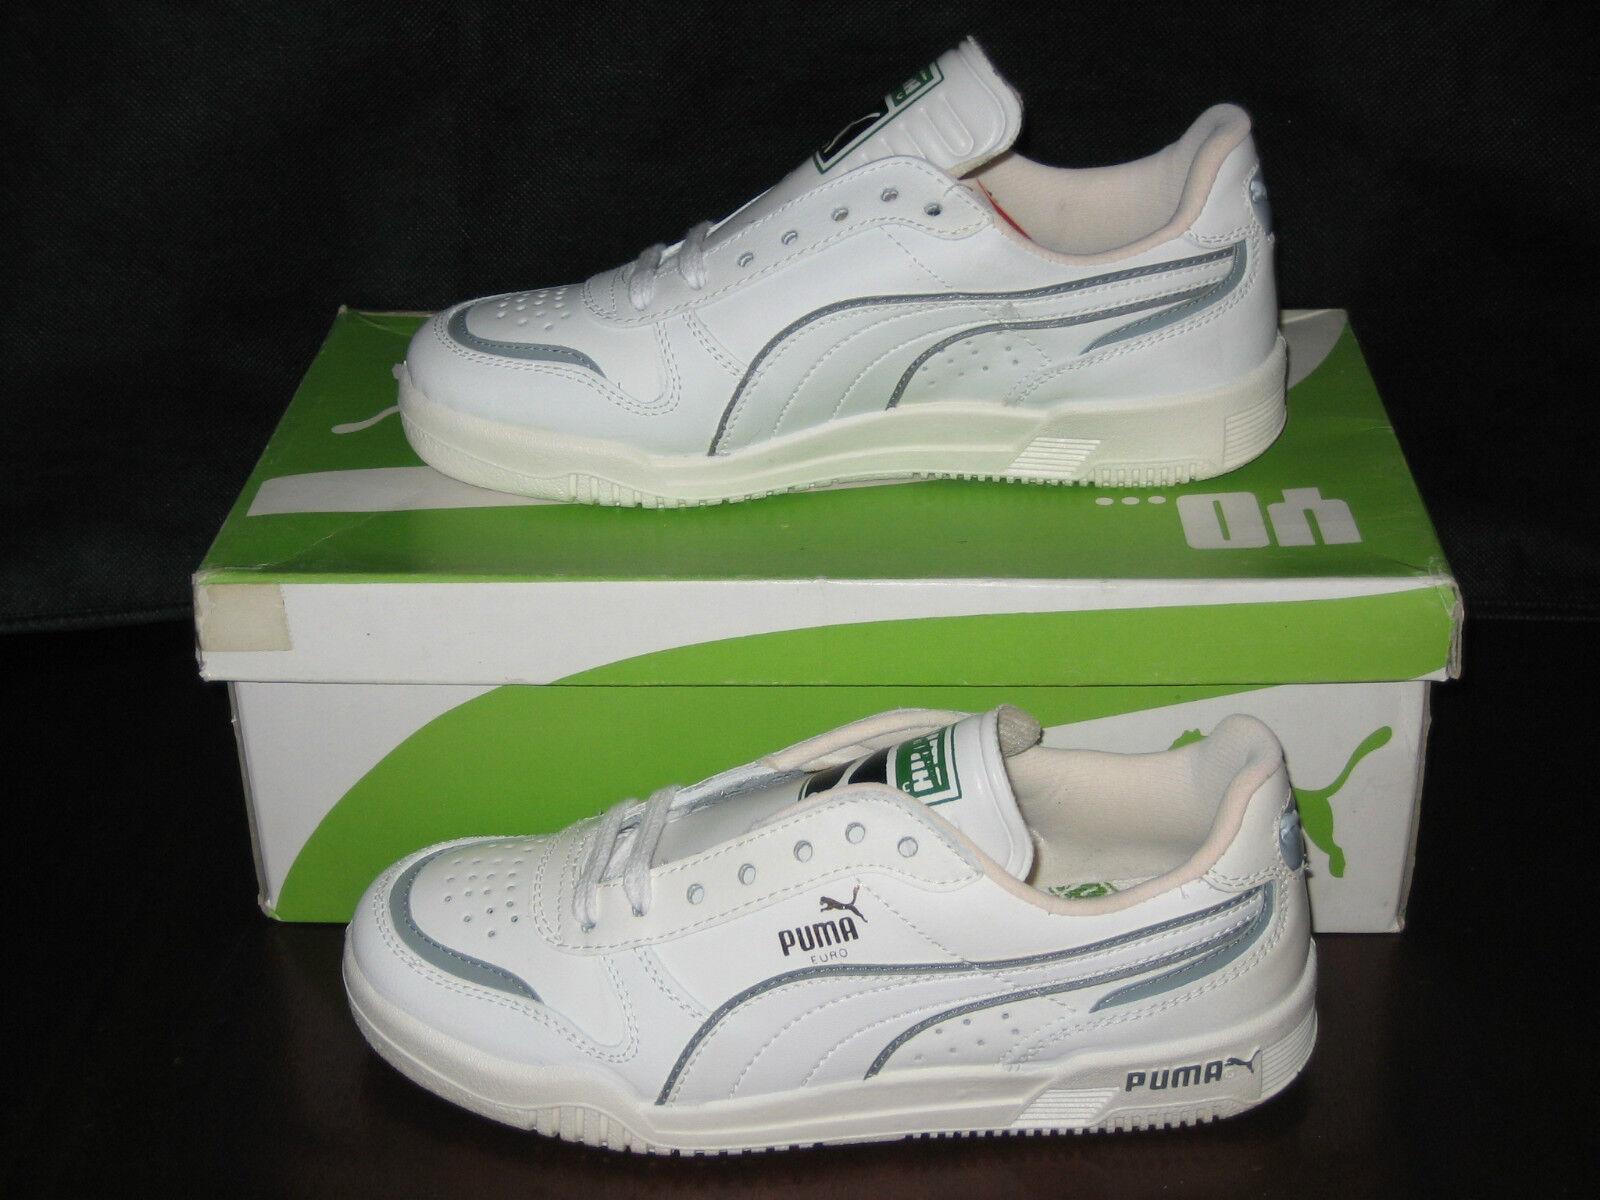 ... Puma Euro 80s EURO 35 NIB NOS vintage vintage vintage ORIGINAL scarpe da  ginnastica fenty creeper ... 20d7e73ec12